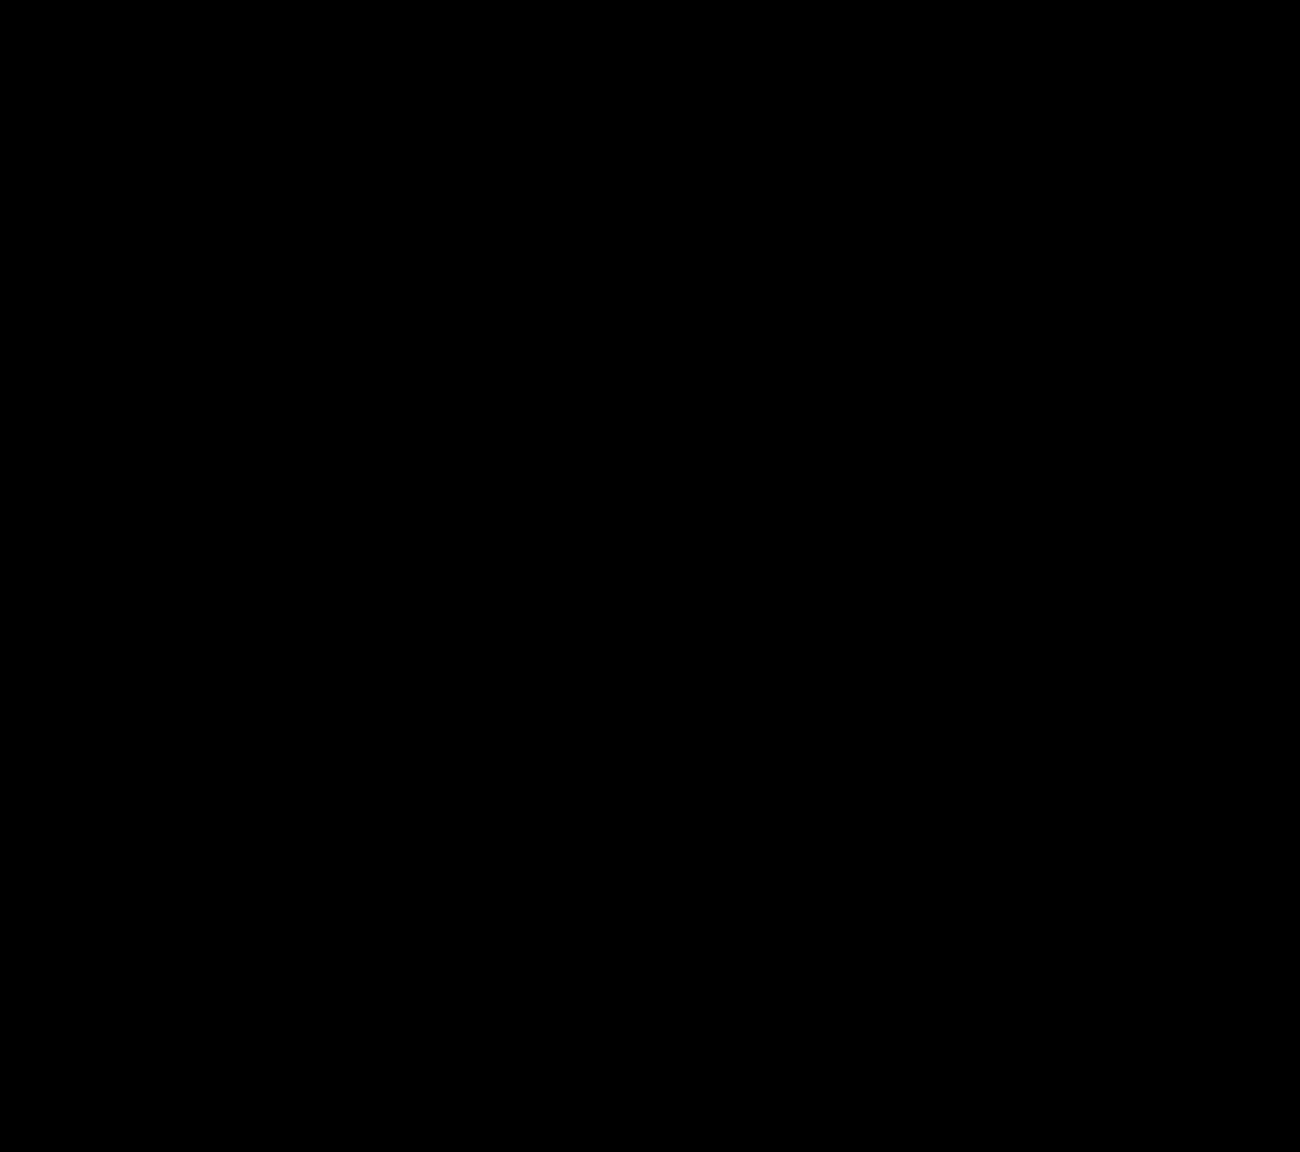 gulvstander med stofbilleder